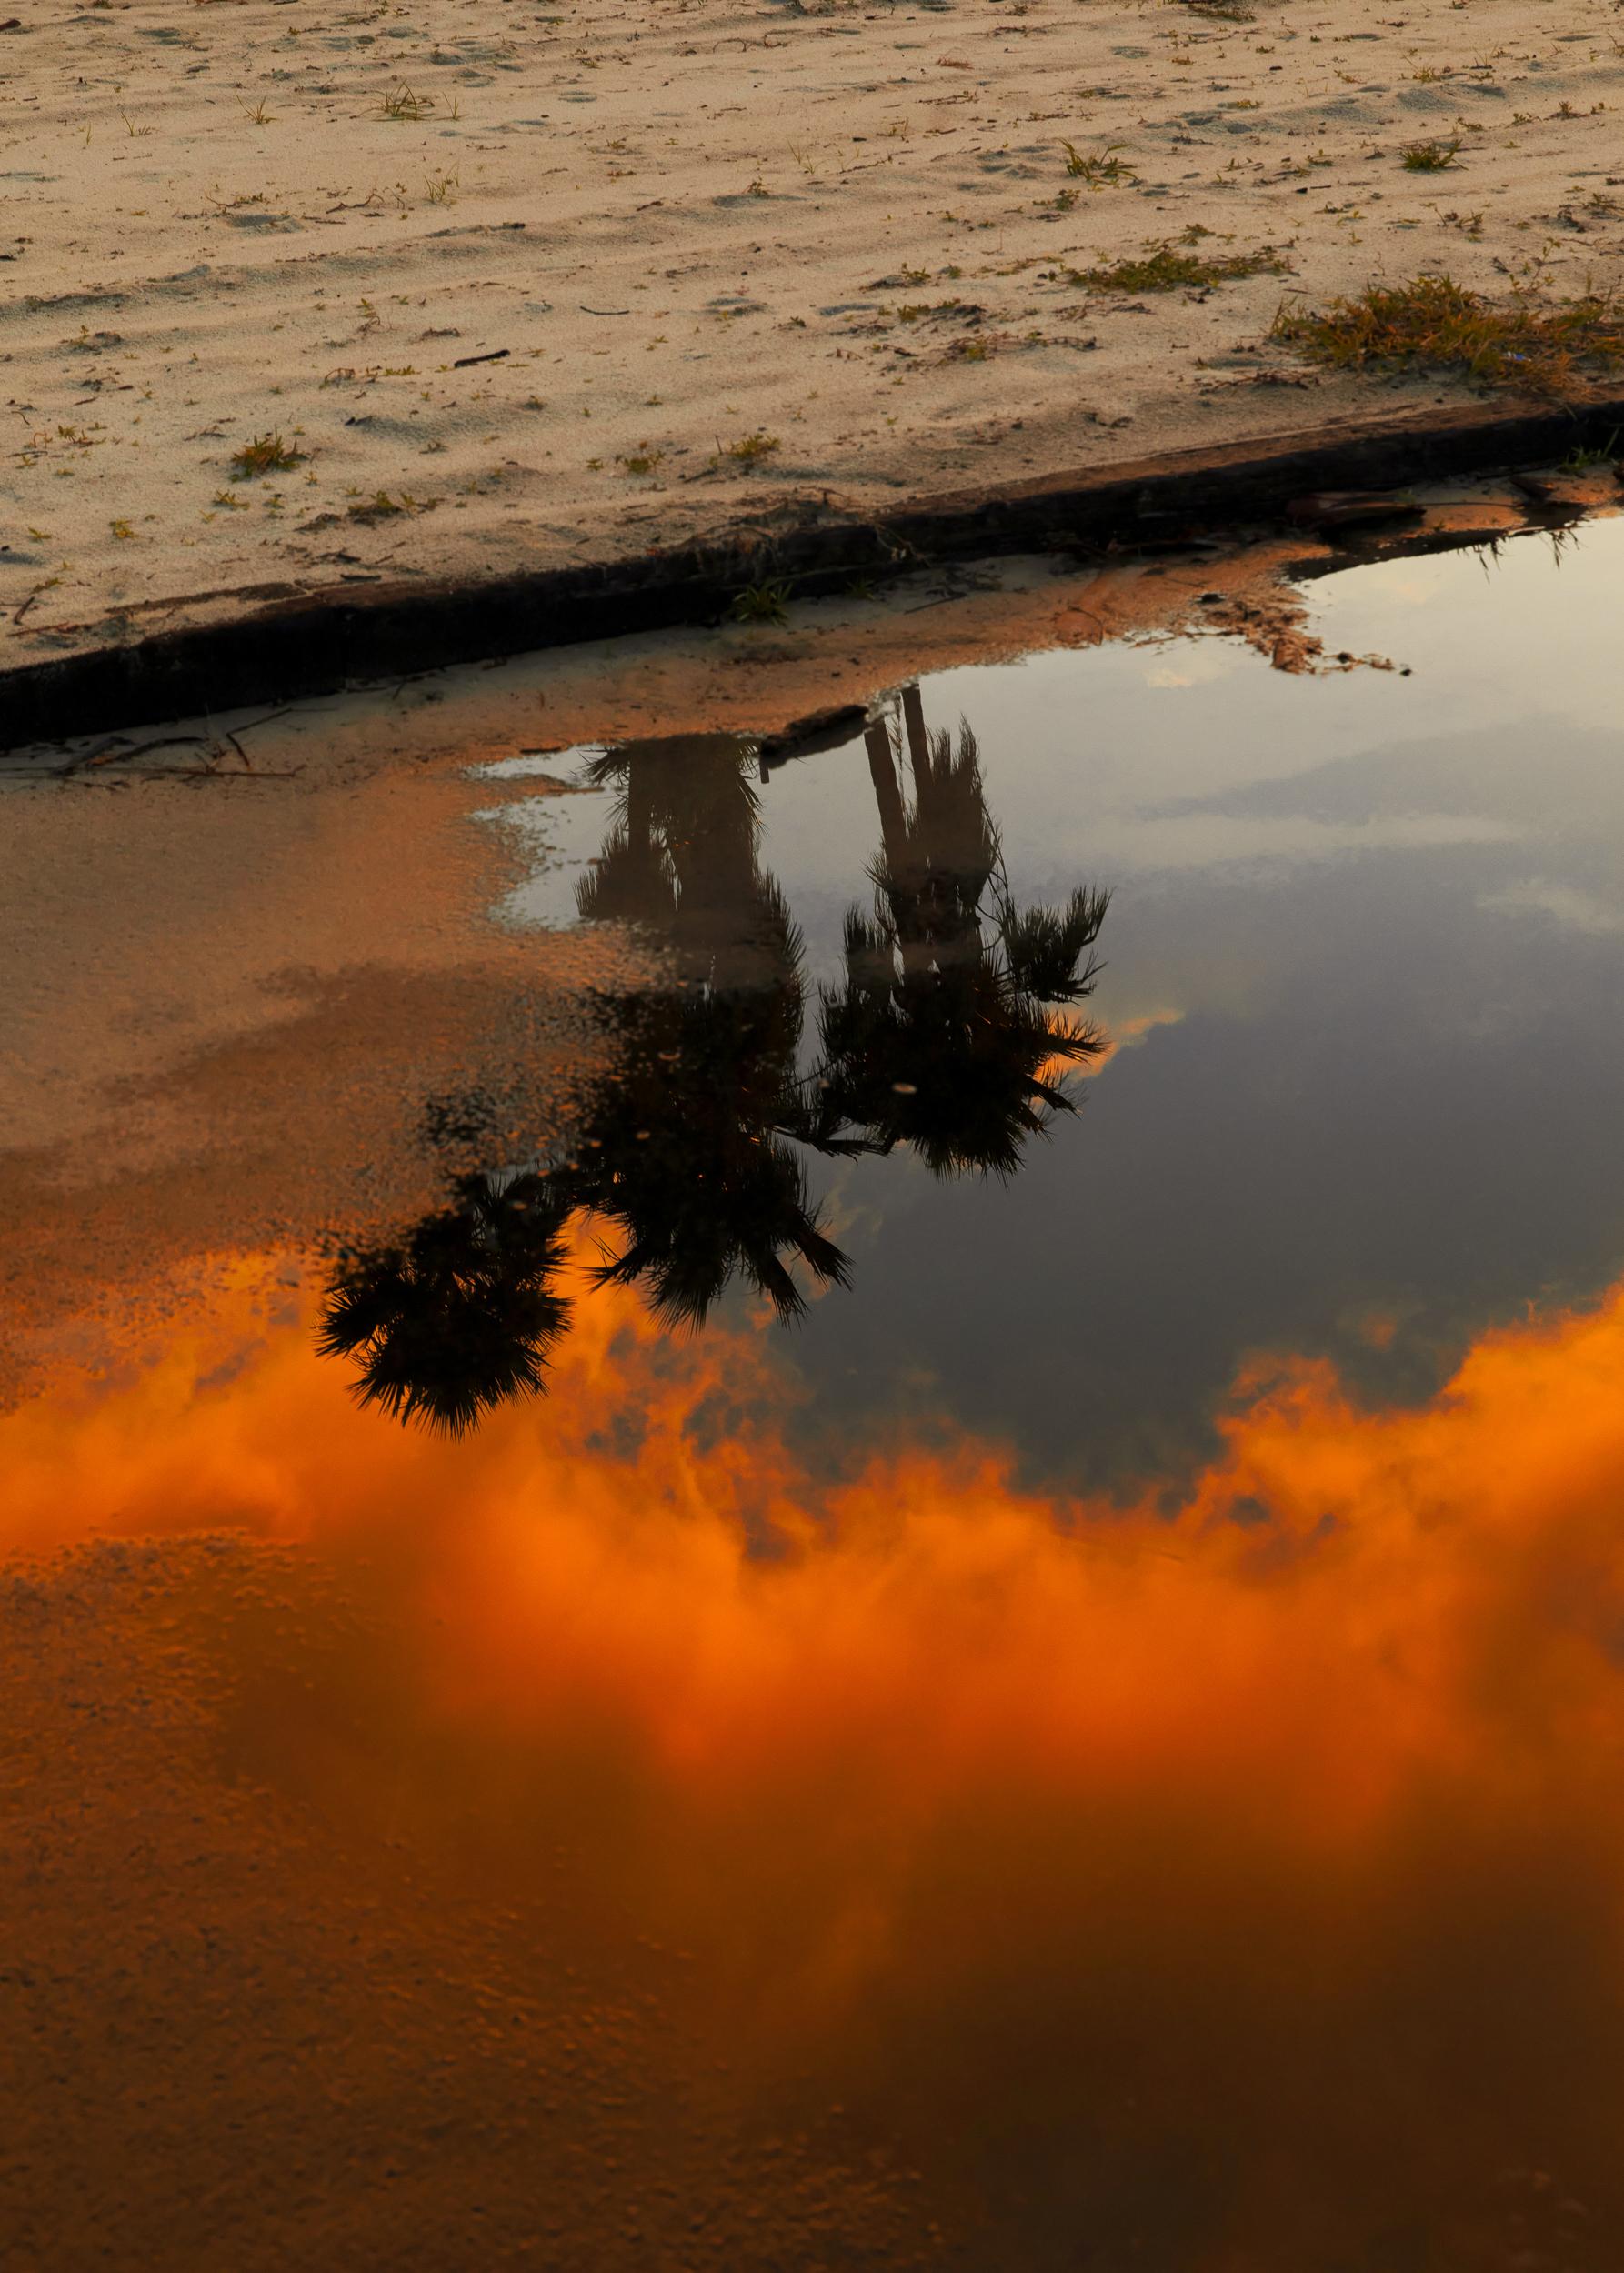 SunriseReflection_10Inches.jpg